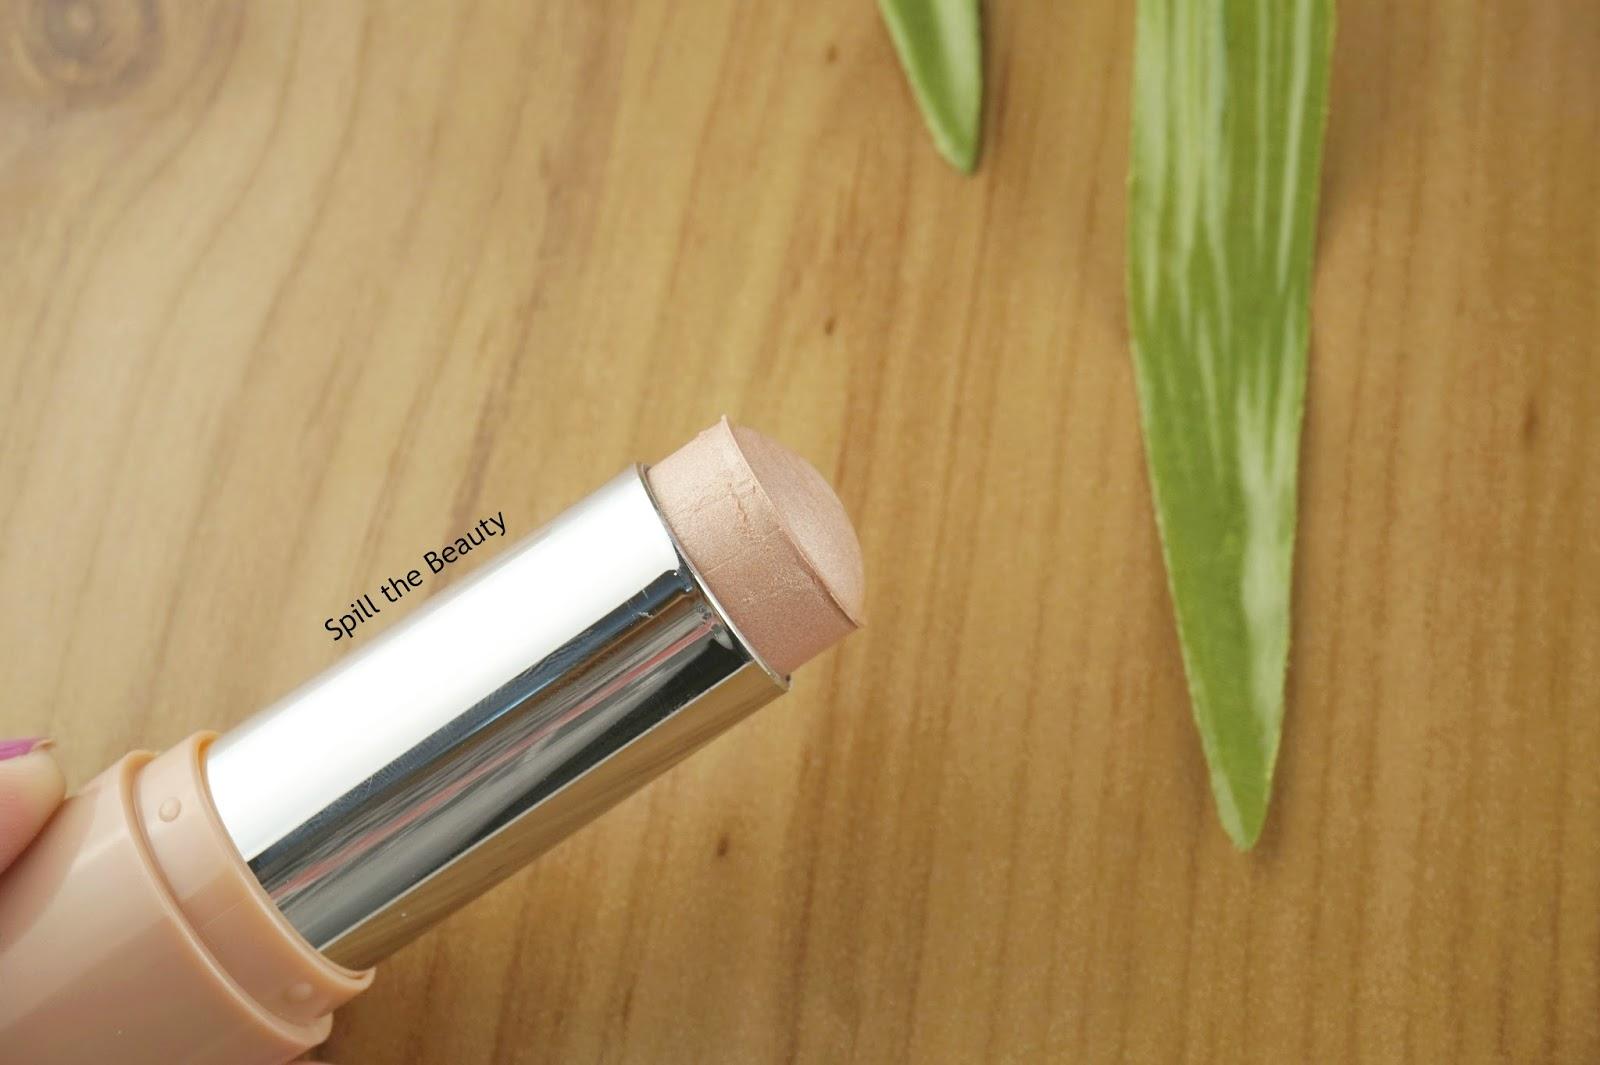 joe fresh 2017 eyeshadow eyeliner highlighter stick lip balm review swatches pink pearl